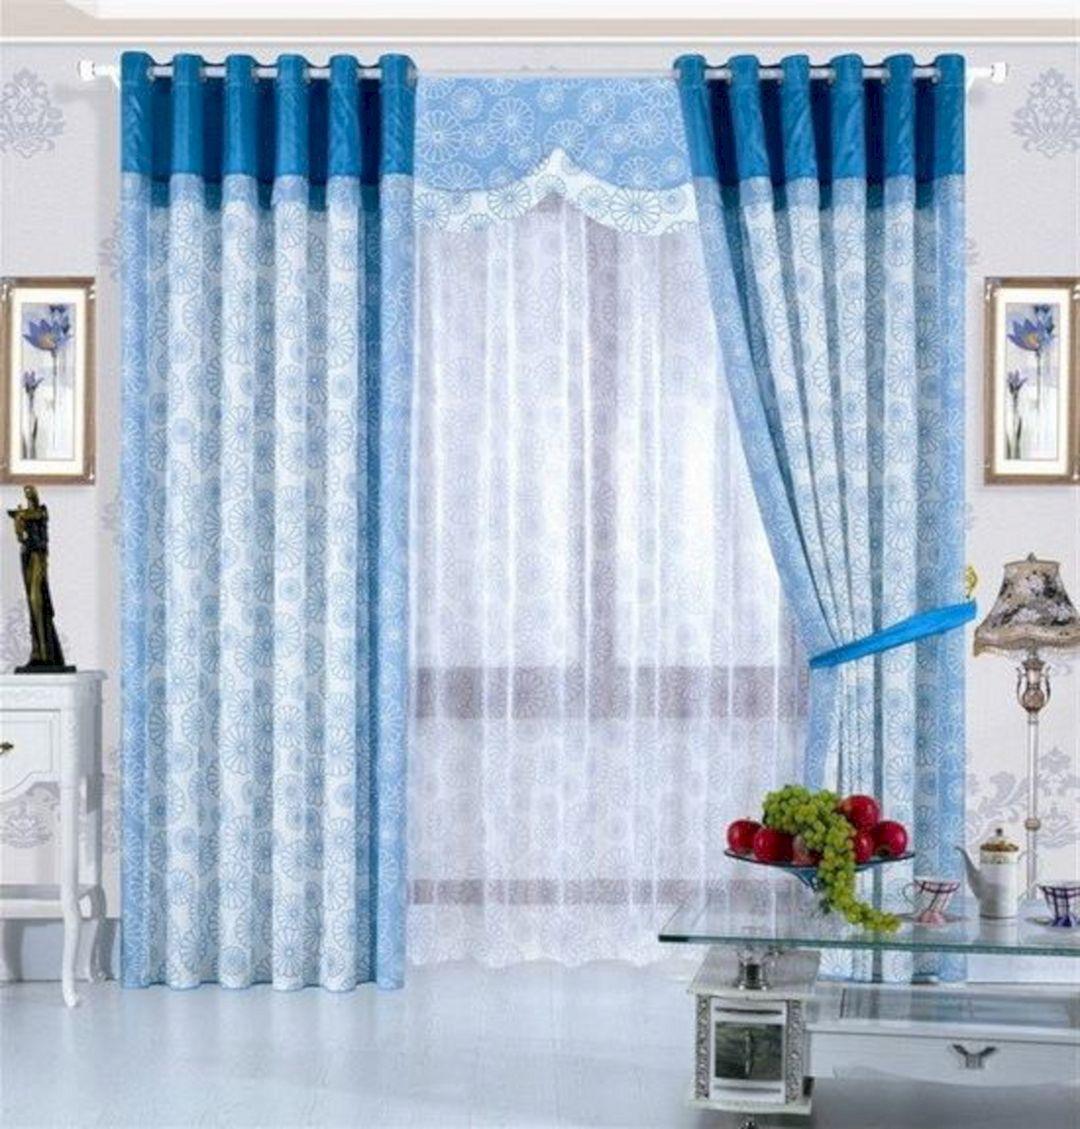 Modern Living Room Curtain For Pretty Home Design Ideas 11